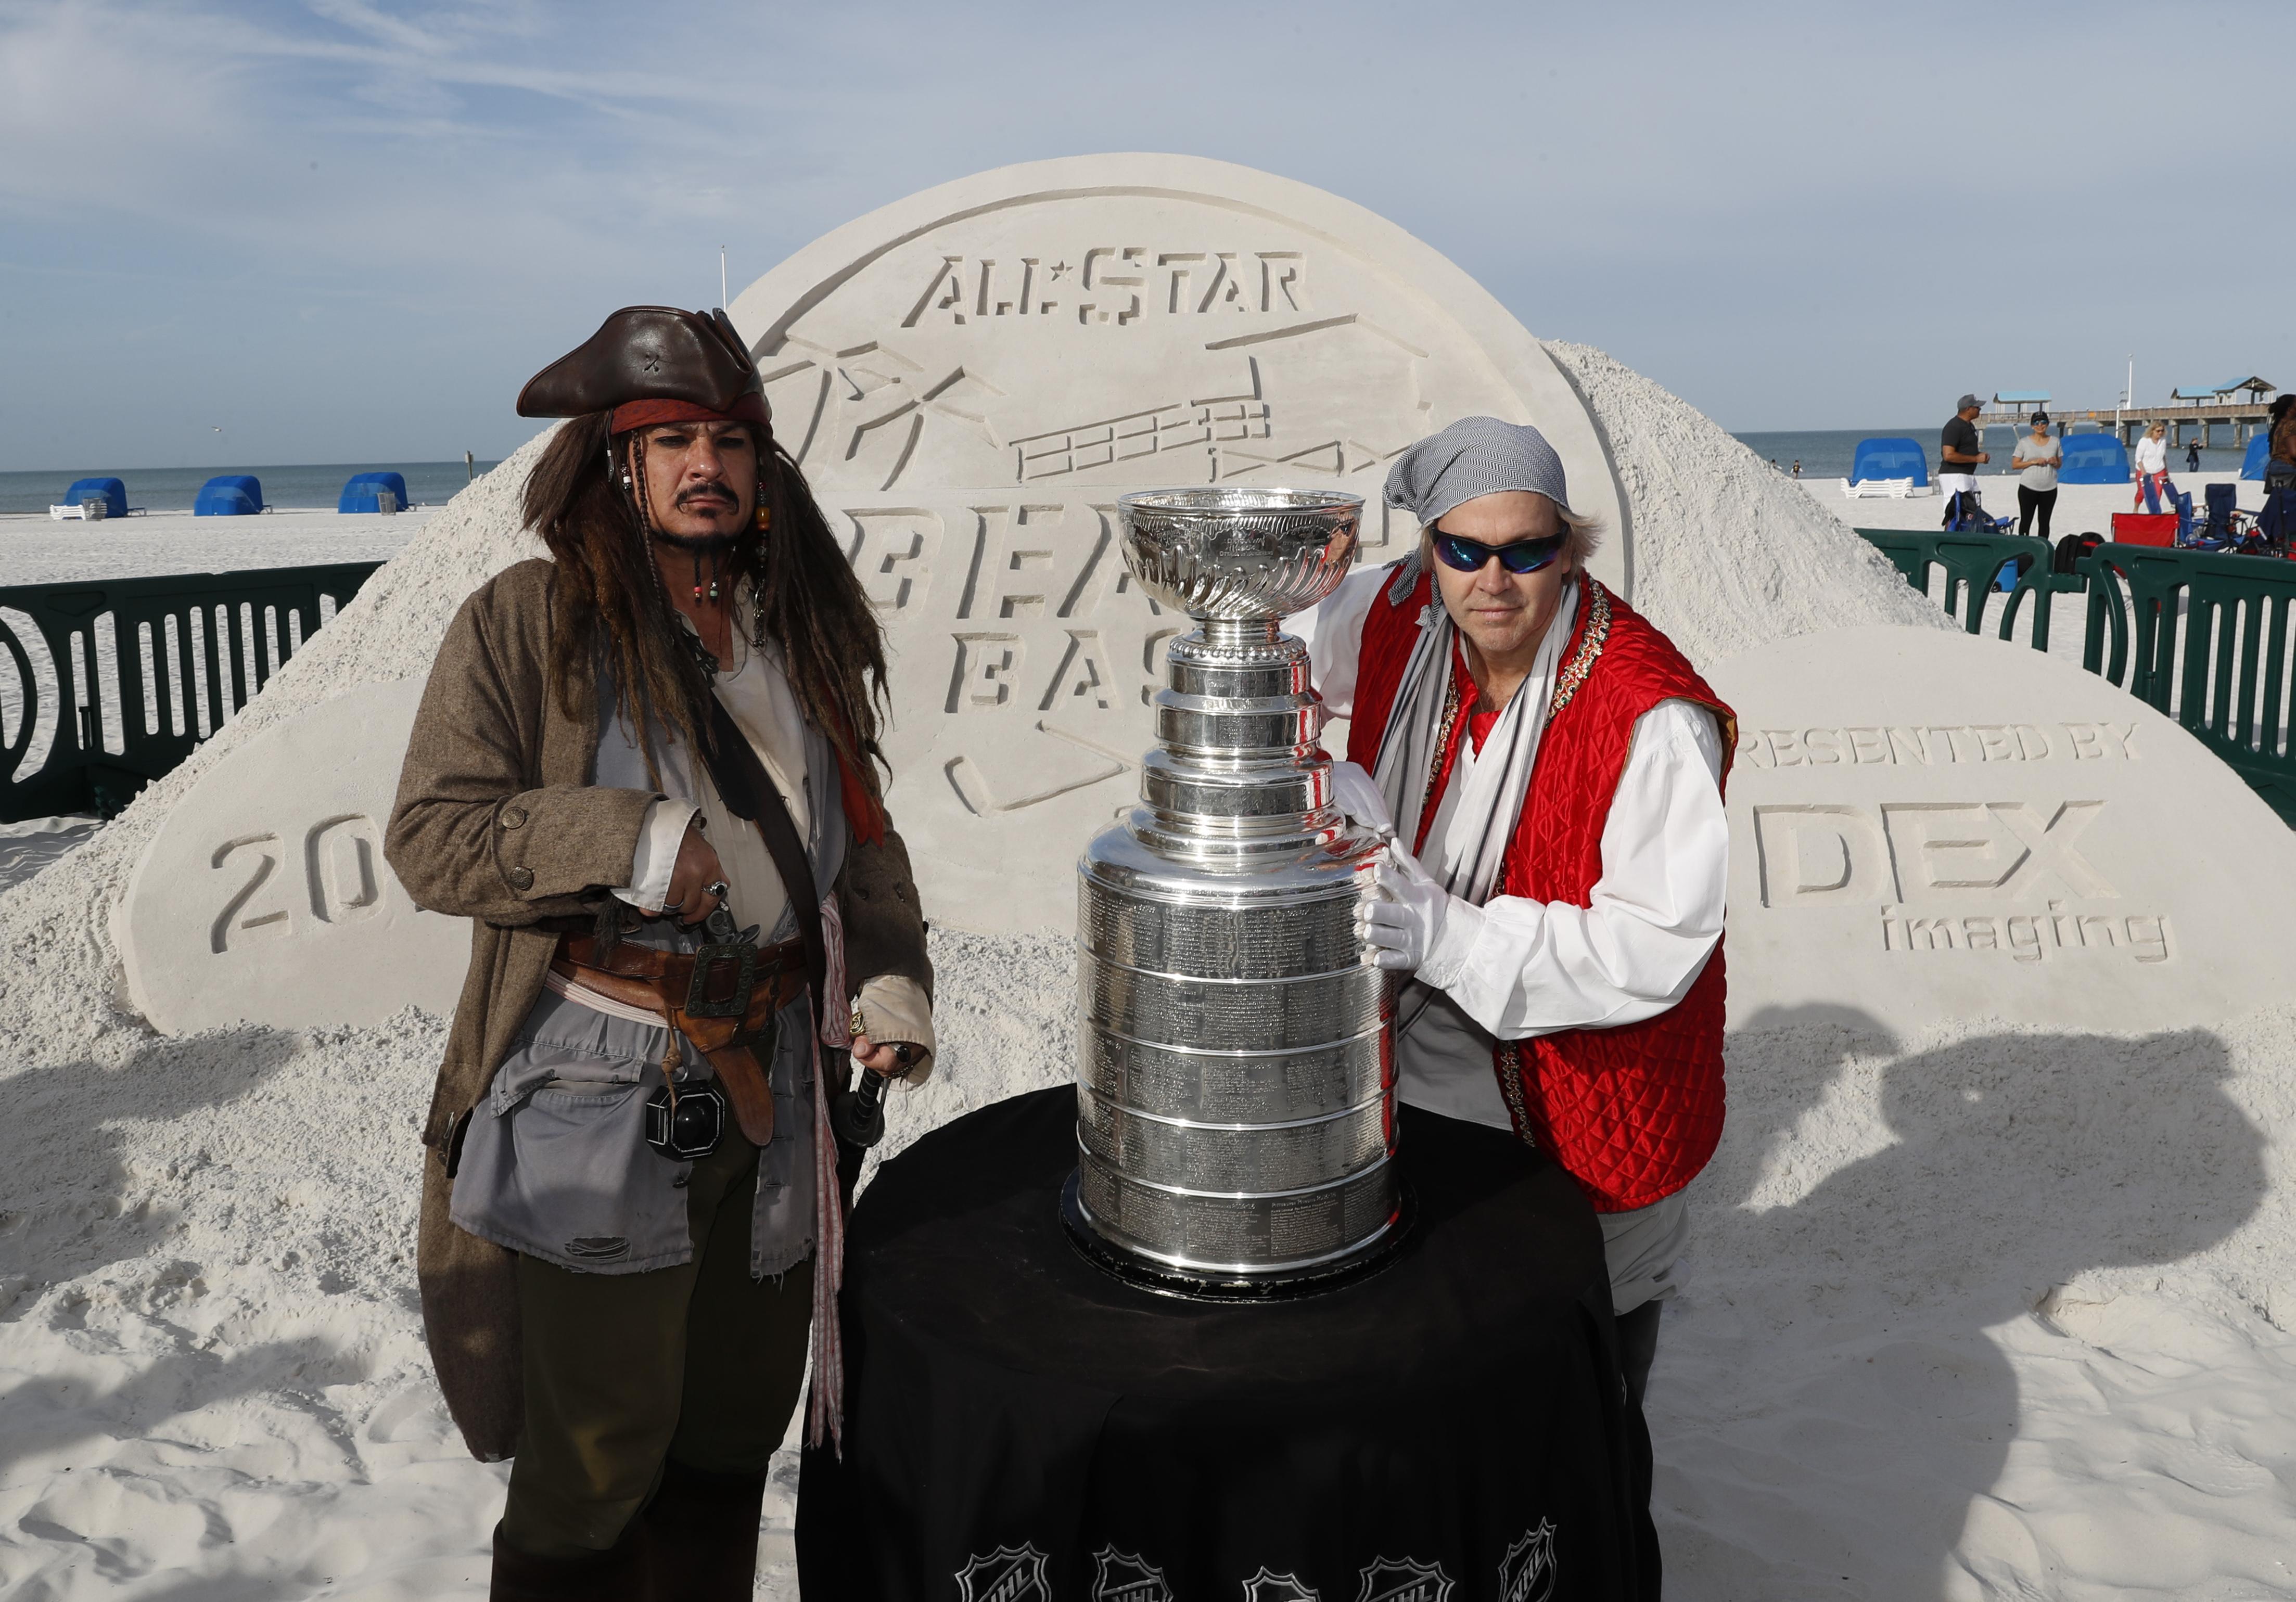 2018 NHL All-Star Beach Bash